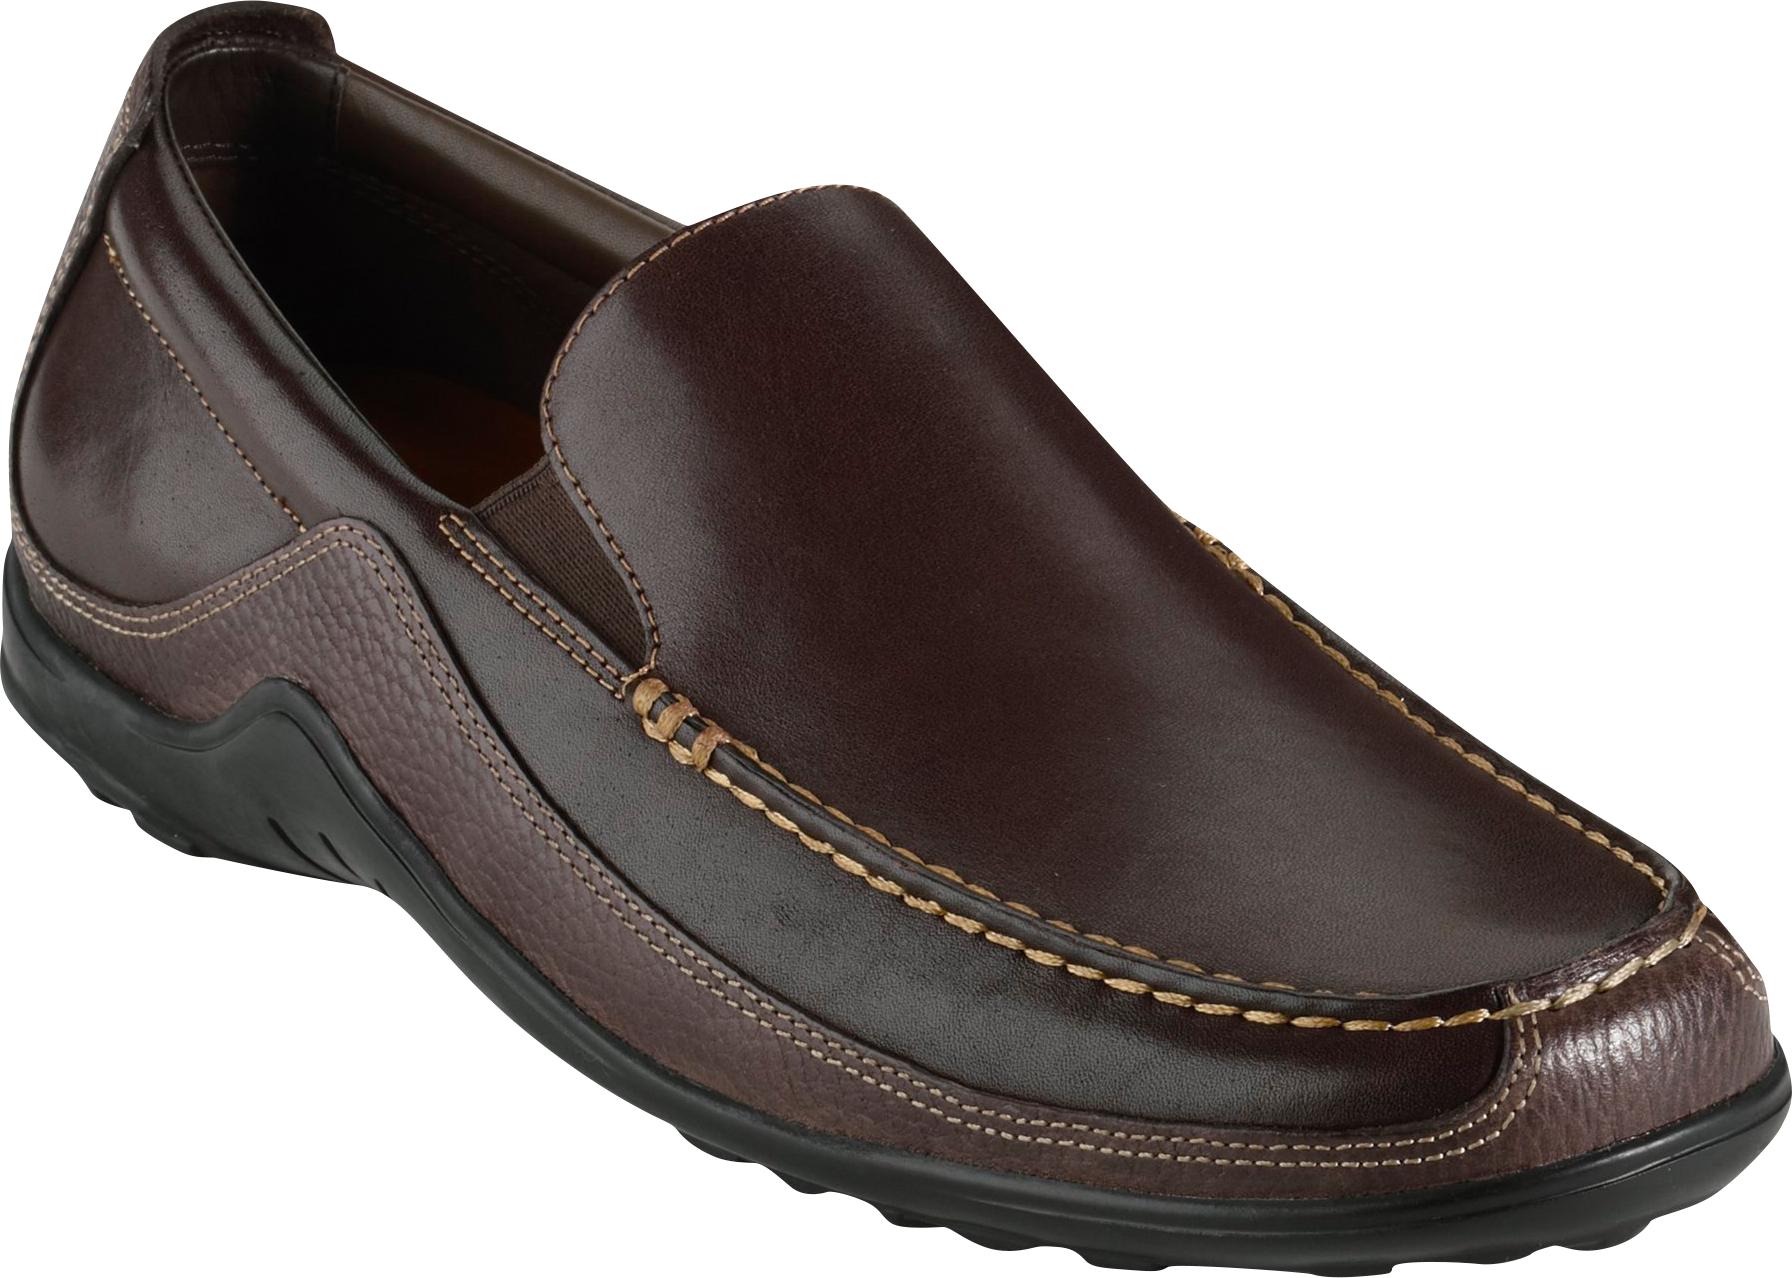 d4577a98d13 Tucker Venetian Shoes by Cole Haan - Cole Haan